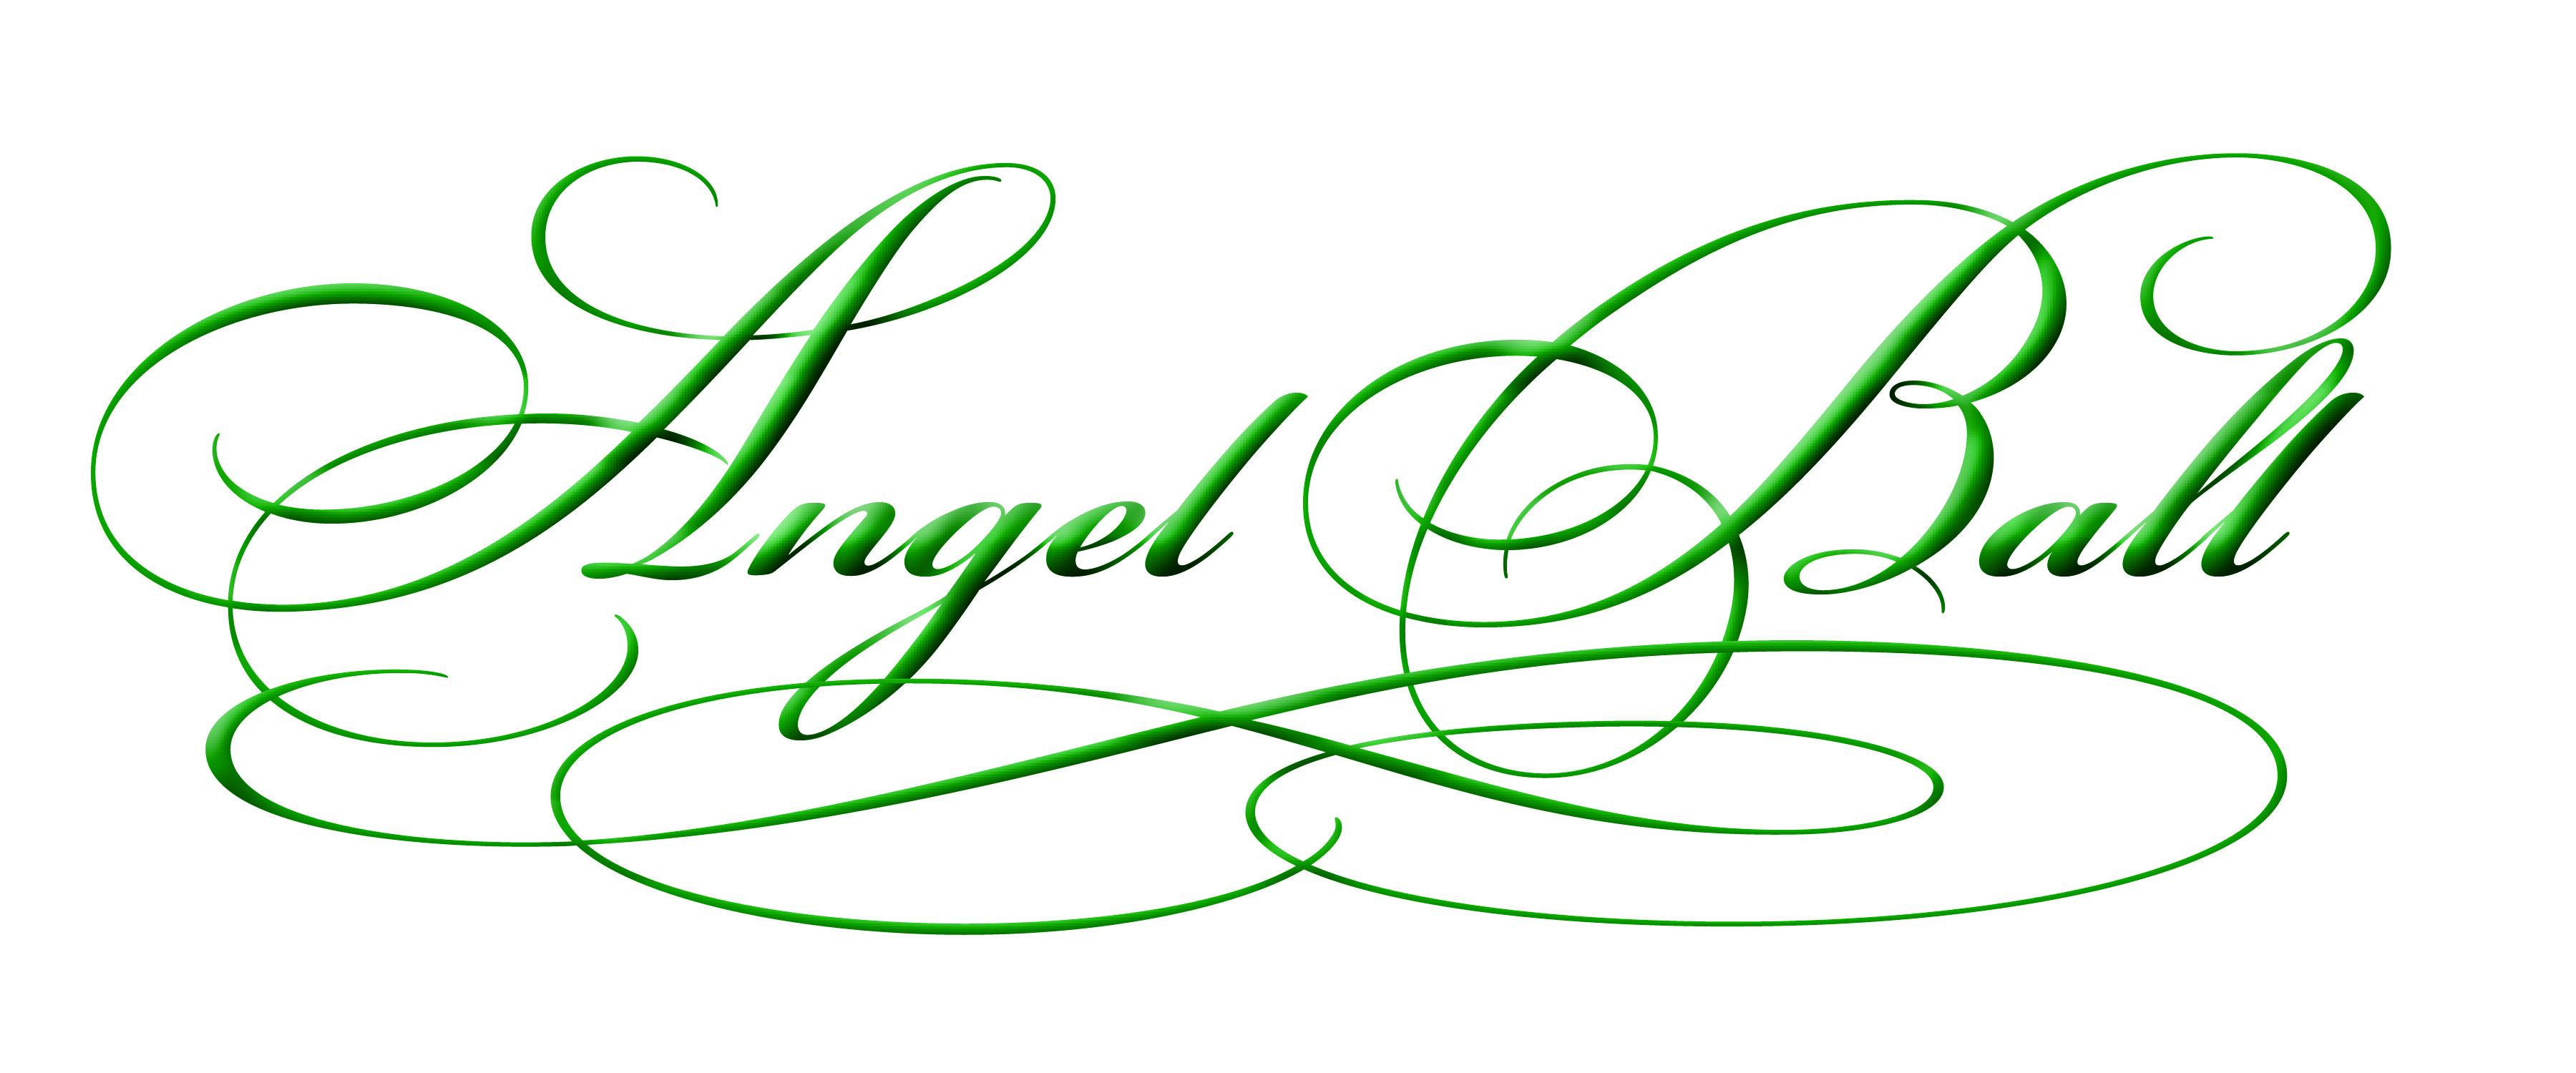 ... 2018u2014Naples Shutter, A Local Plantation Shutter Manufacturer Announces  Its Participation In The Community School Of Naples (CSN), Angel Ball.